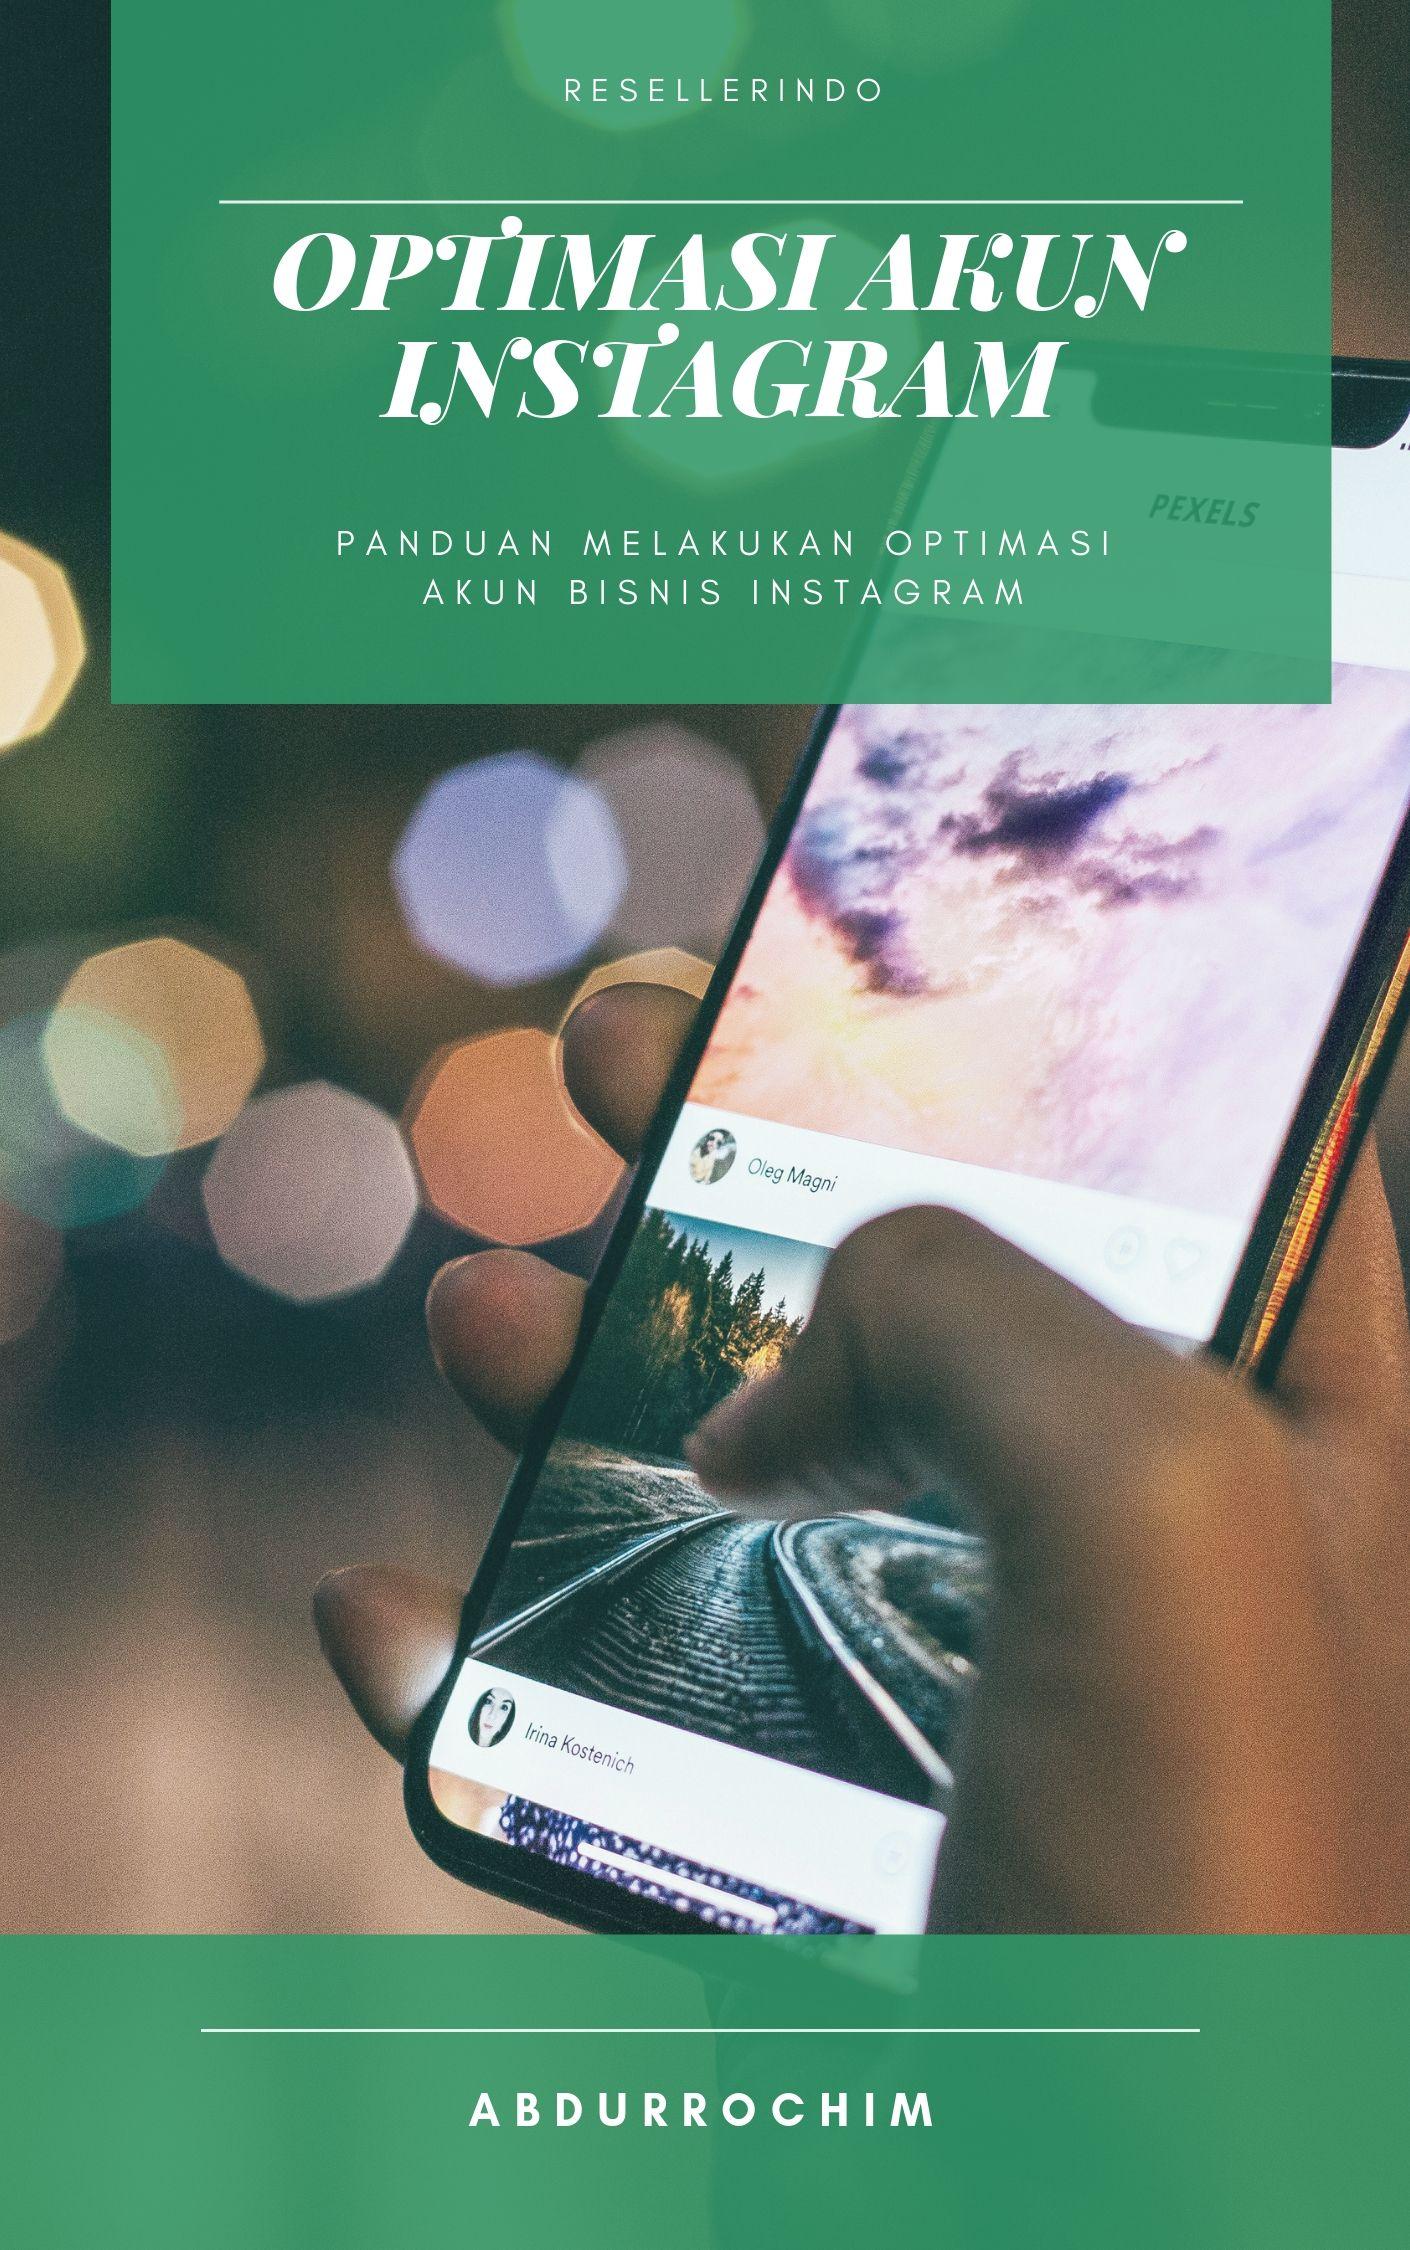 optimasi akun bisnis Instagram